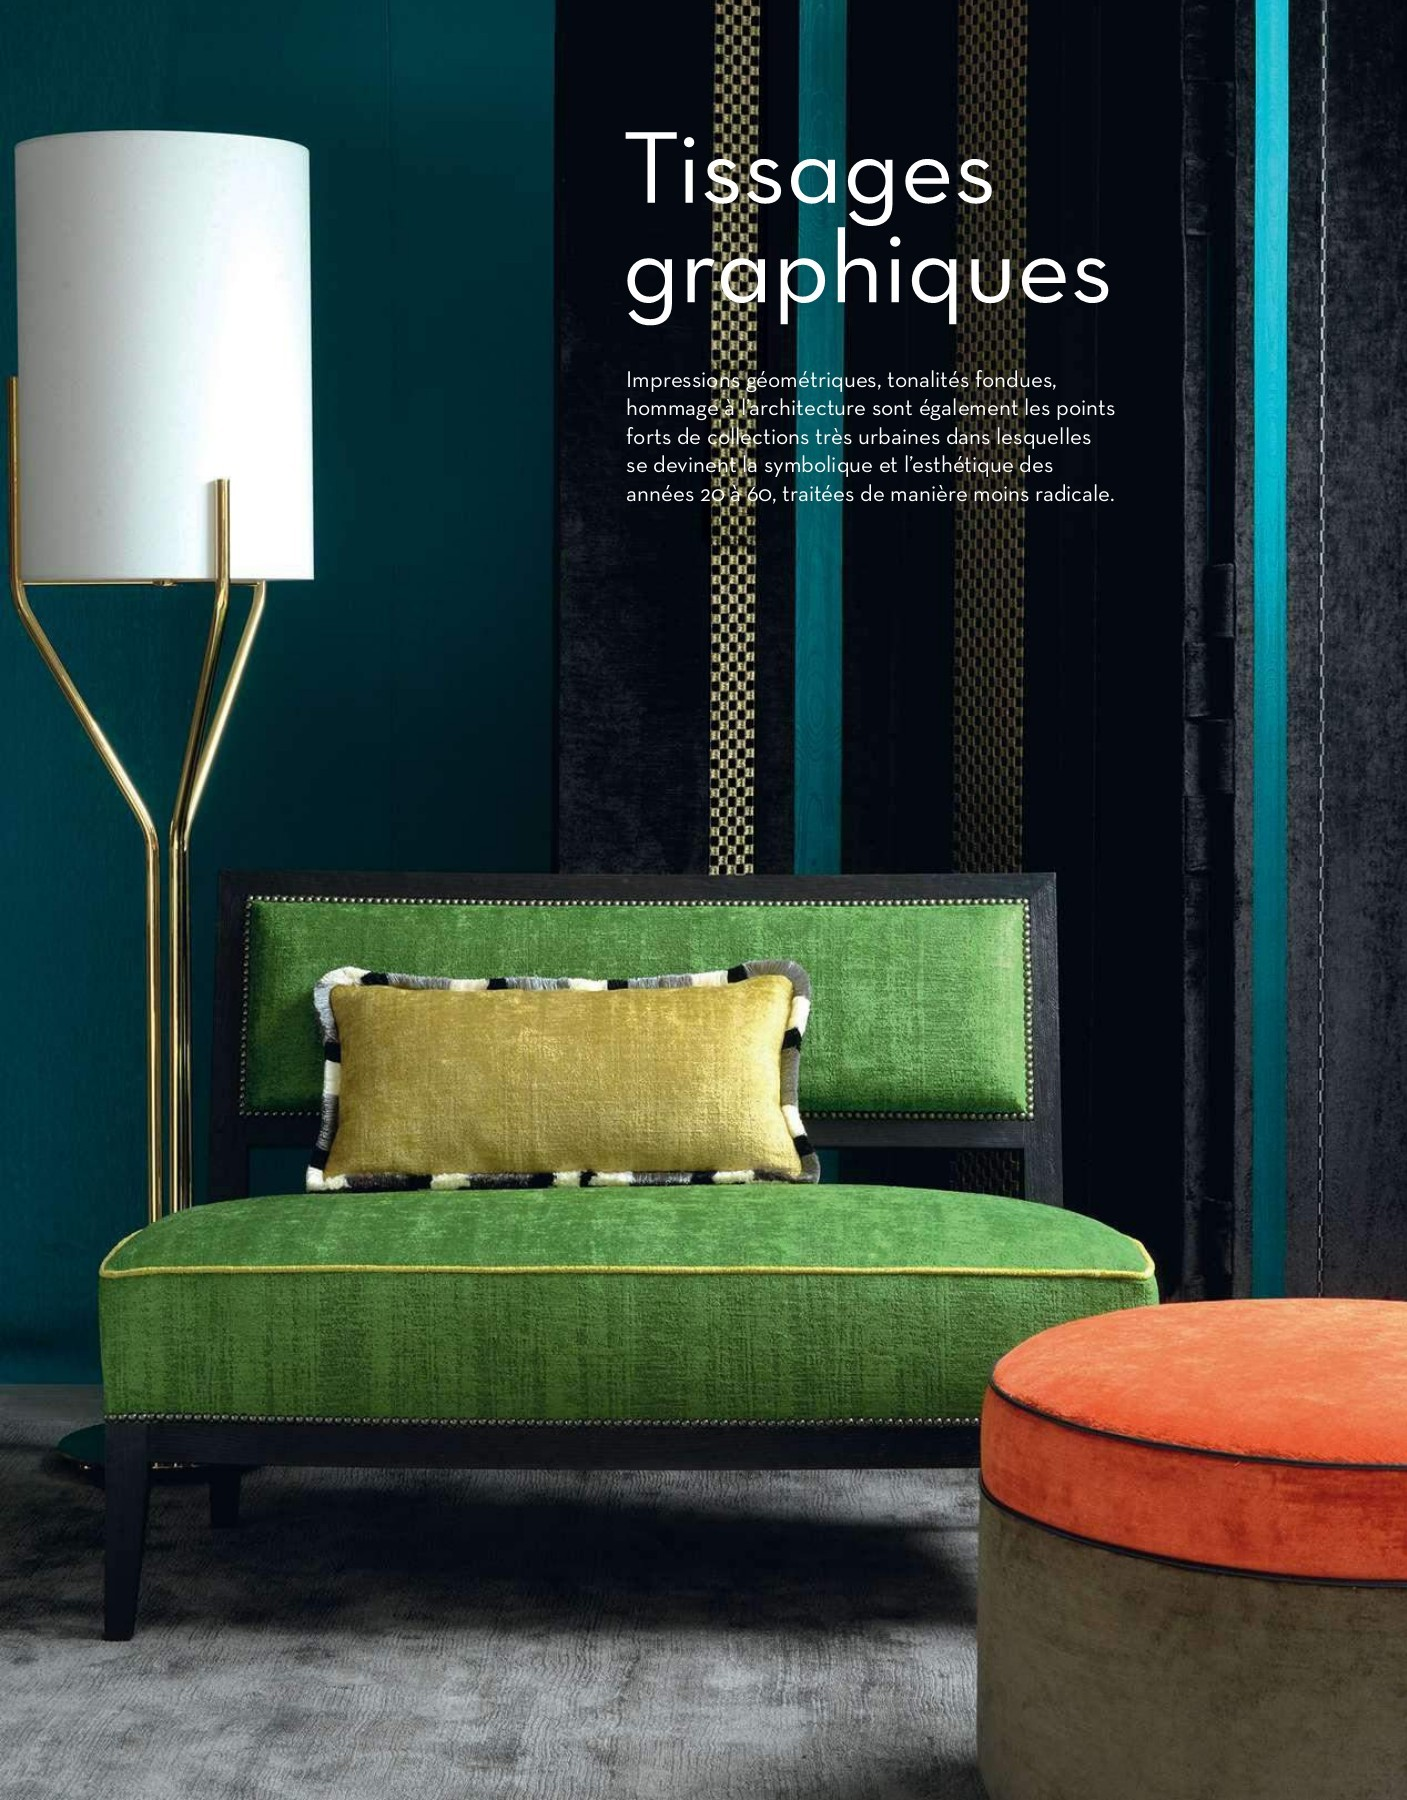 Boconcept Rue De Rennes ideat france__septembre-octobre_2017-flip book pages 301-350